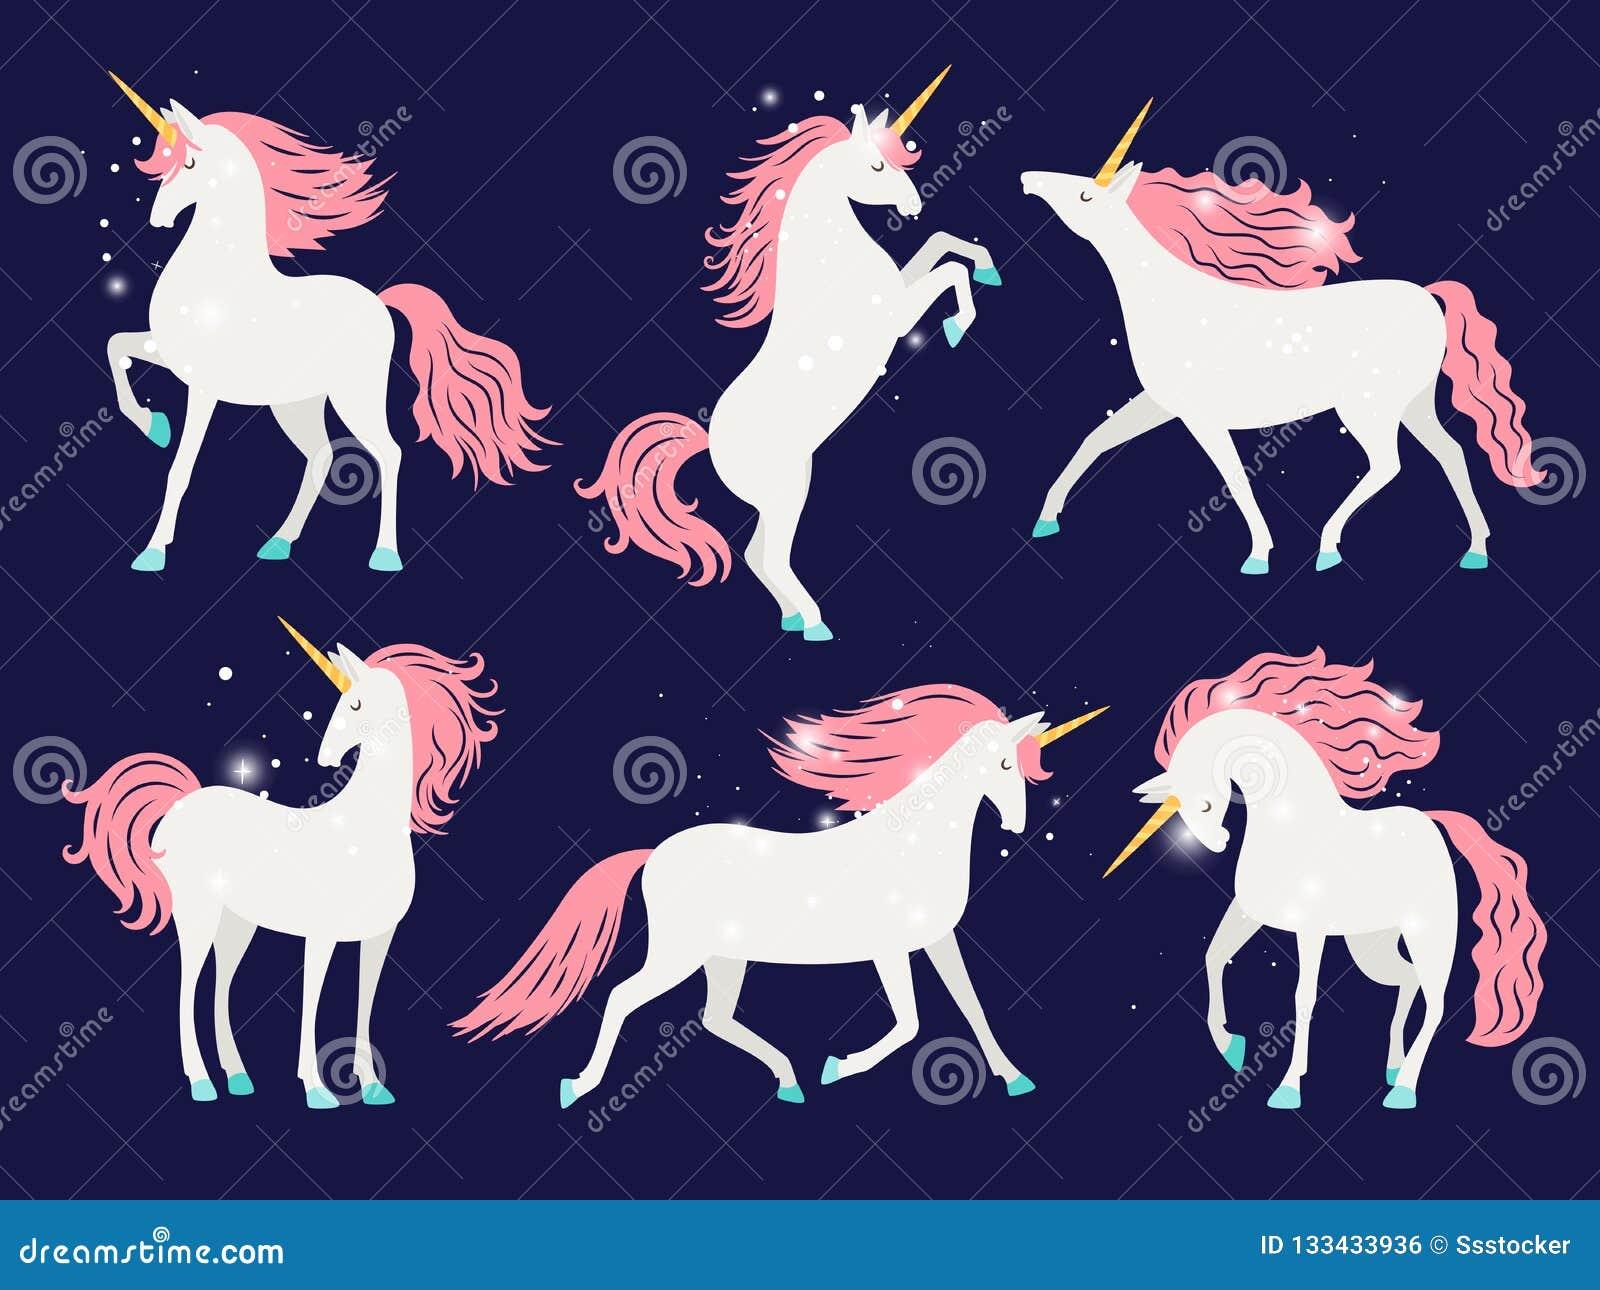 White Unicorn With Pink Mane Cartoon Pretty Unicorn Horse With Rose Mane For Girls T Shirt Design Vector Illustration Stock Vector Illustration Of Fantasy Little 133433936